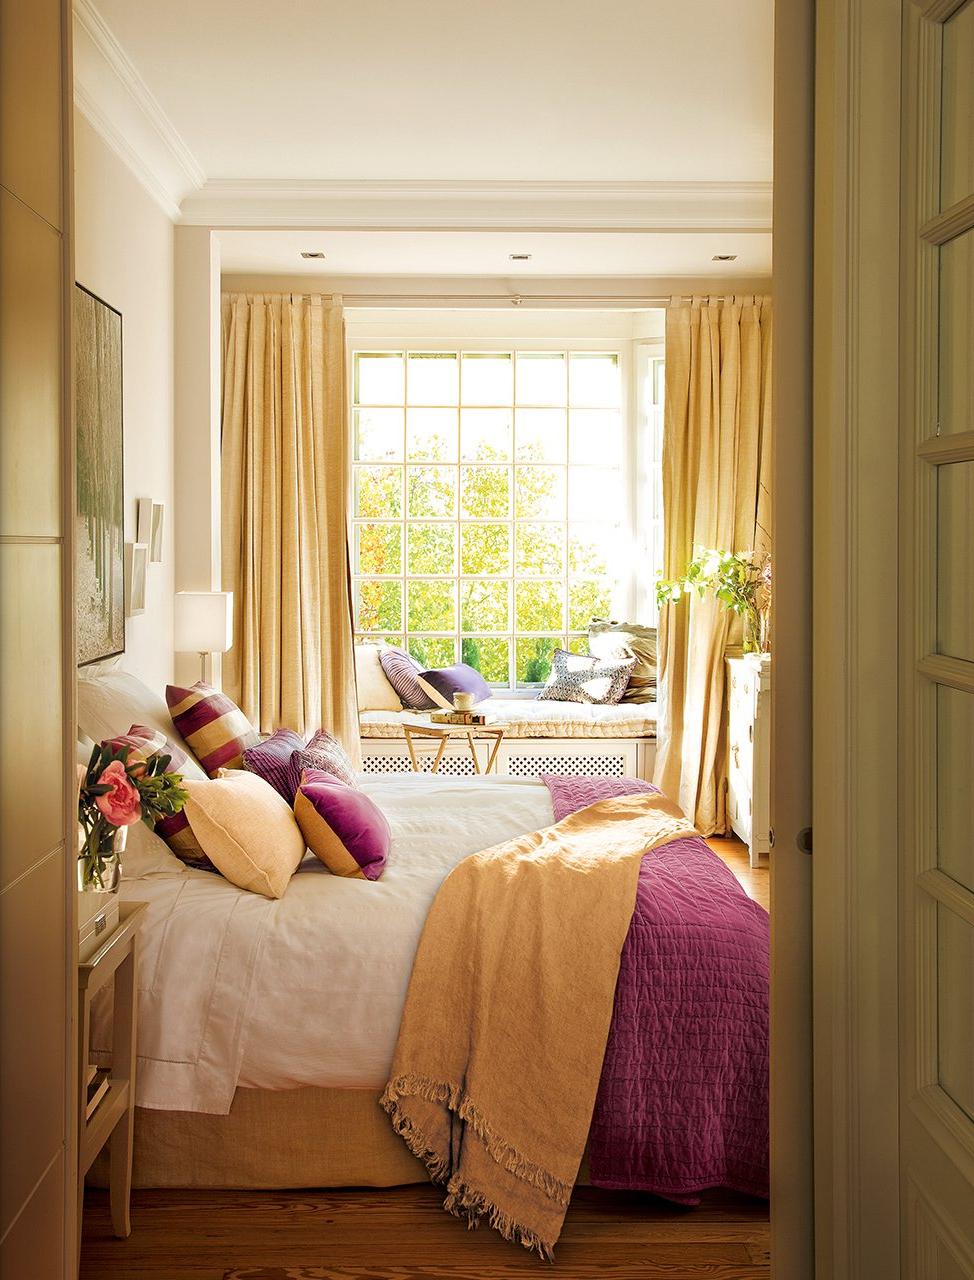 21 Charming Comfortable Bedroom Interior Design